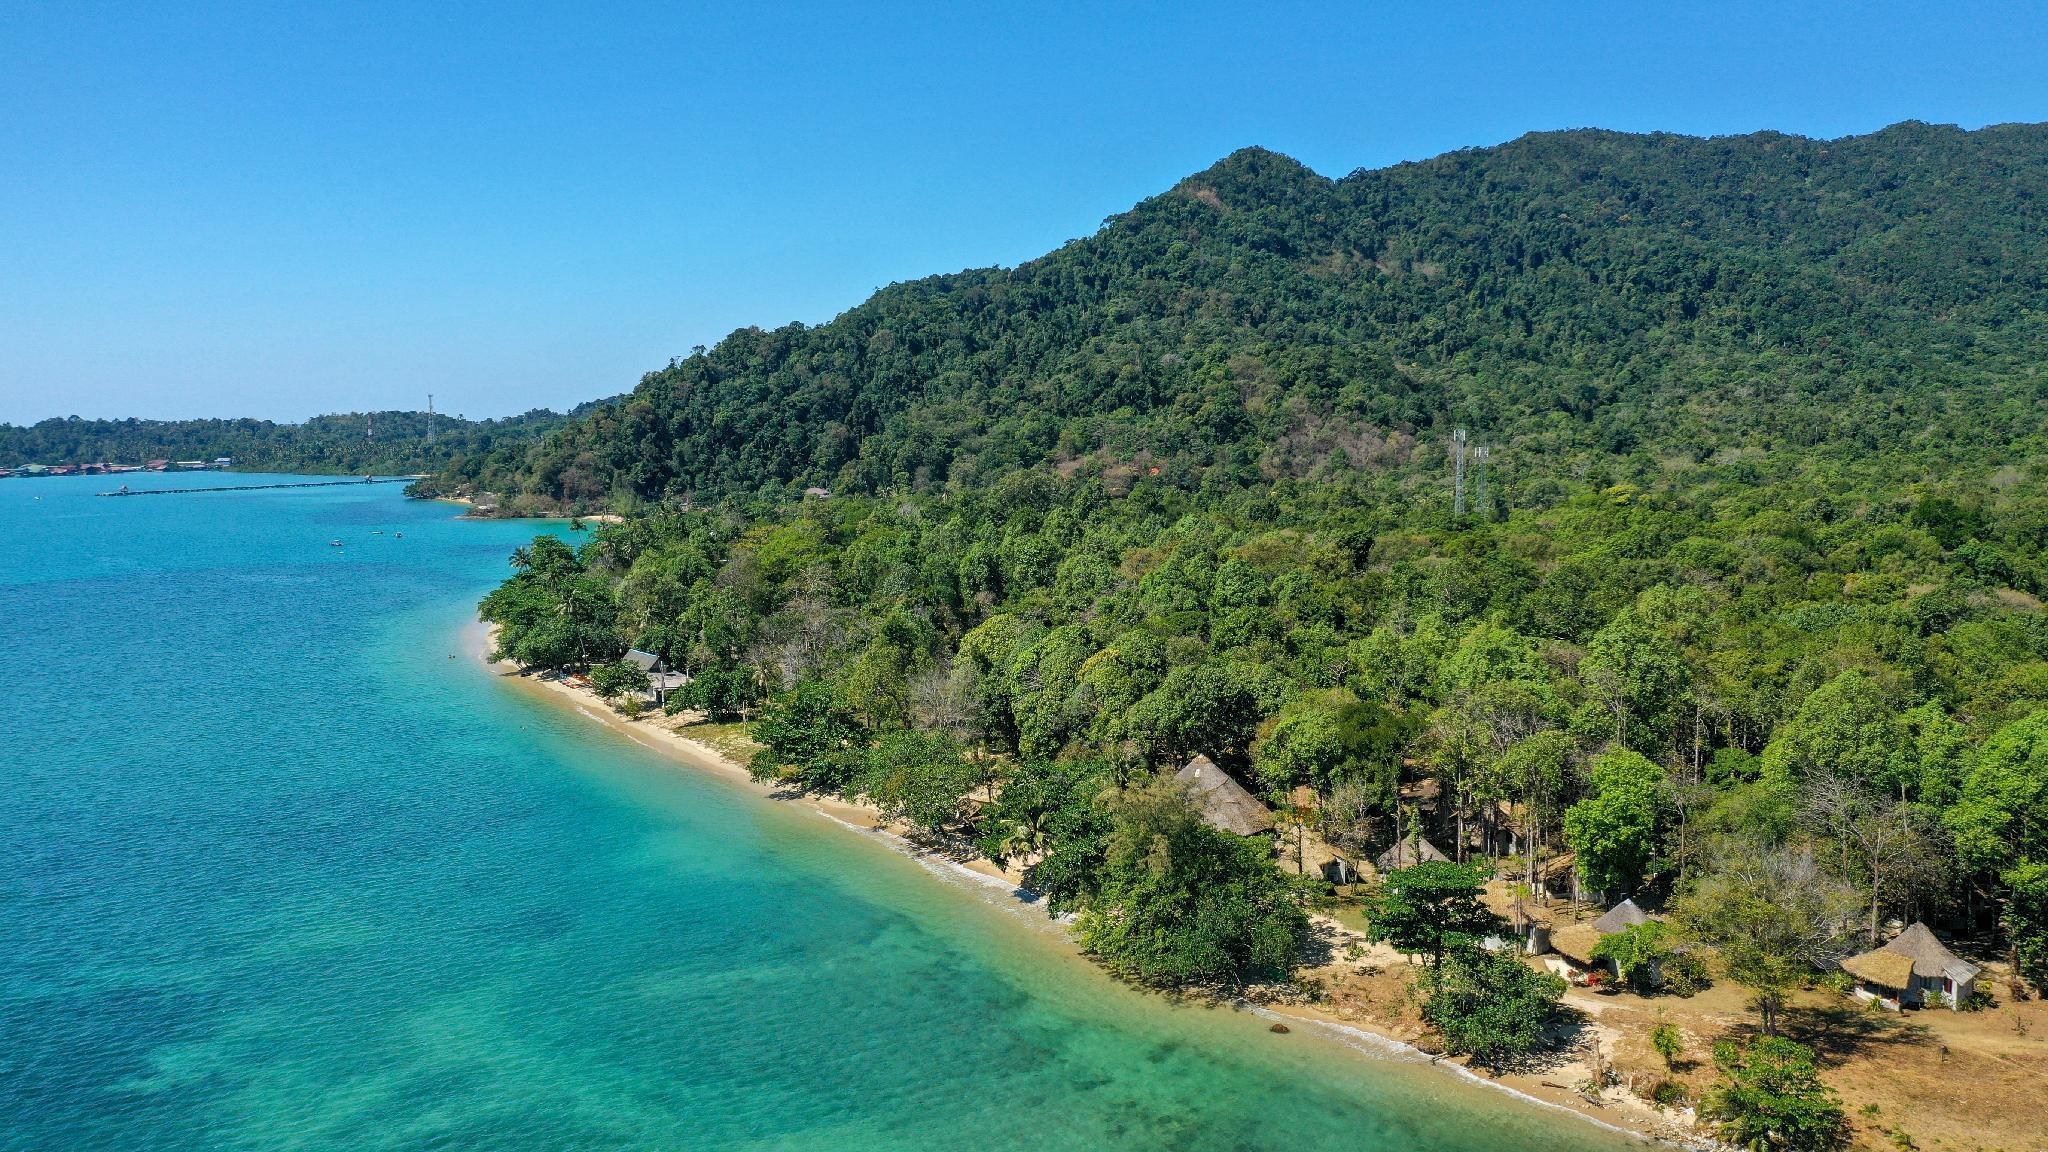 The Tropical Beach Resort เดอะ ทรอปิคัล บีช รีสอร์ต